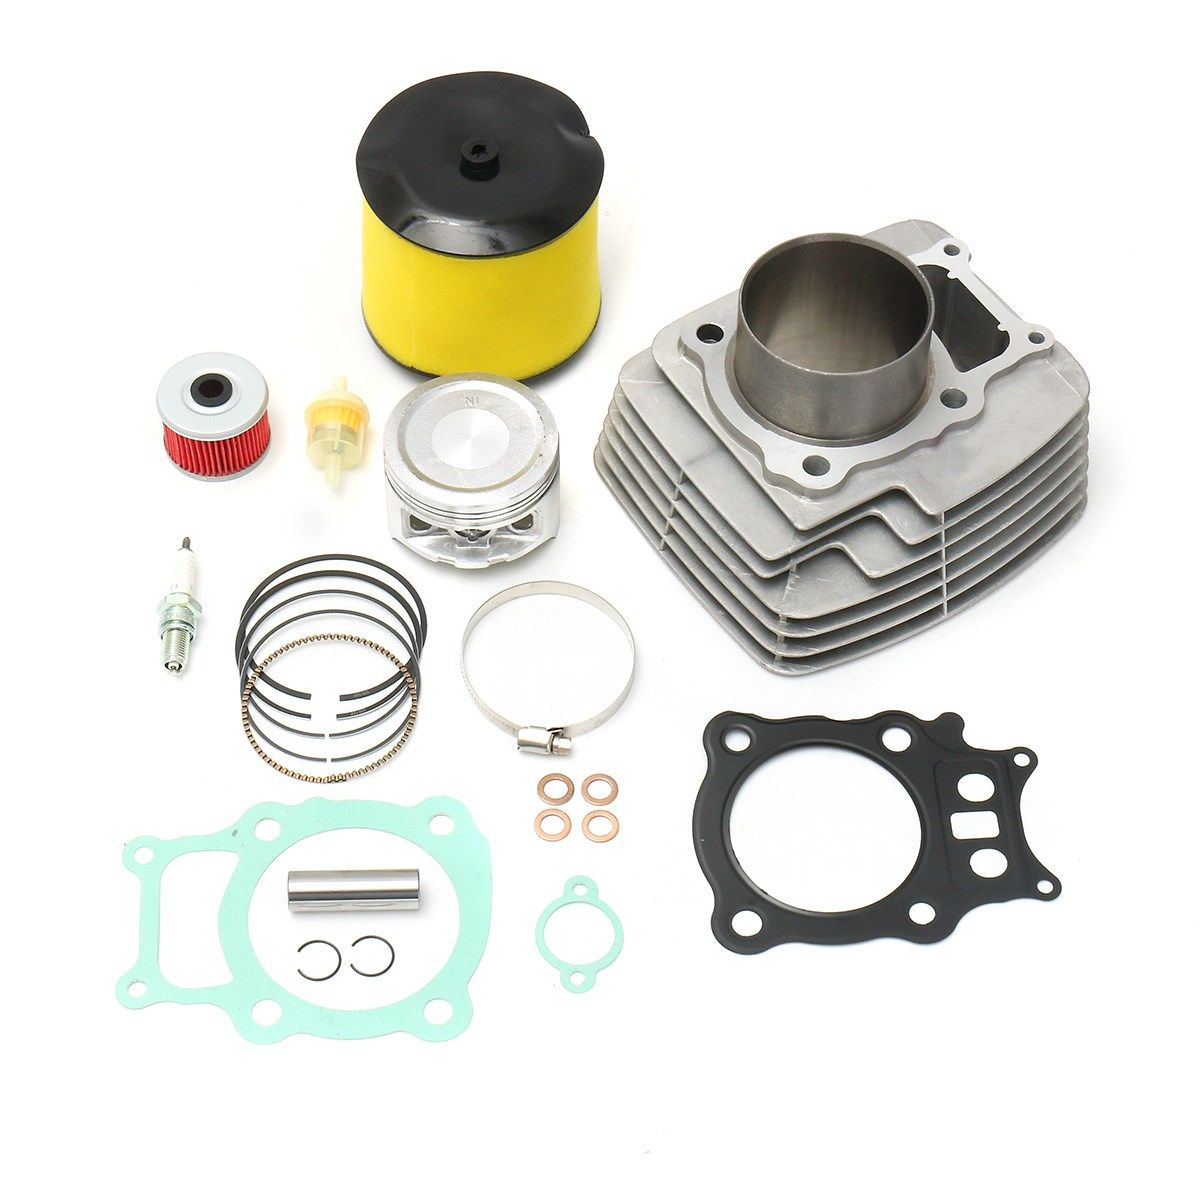 honda rancher 350 fuel filter wiring diagram centreatv cylinder piston for spark plug oil fuel filter [ 1200 x 1200 Pixel ]